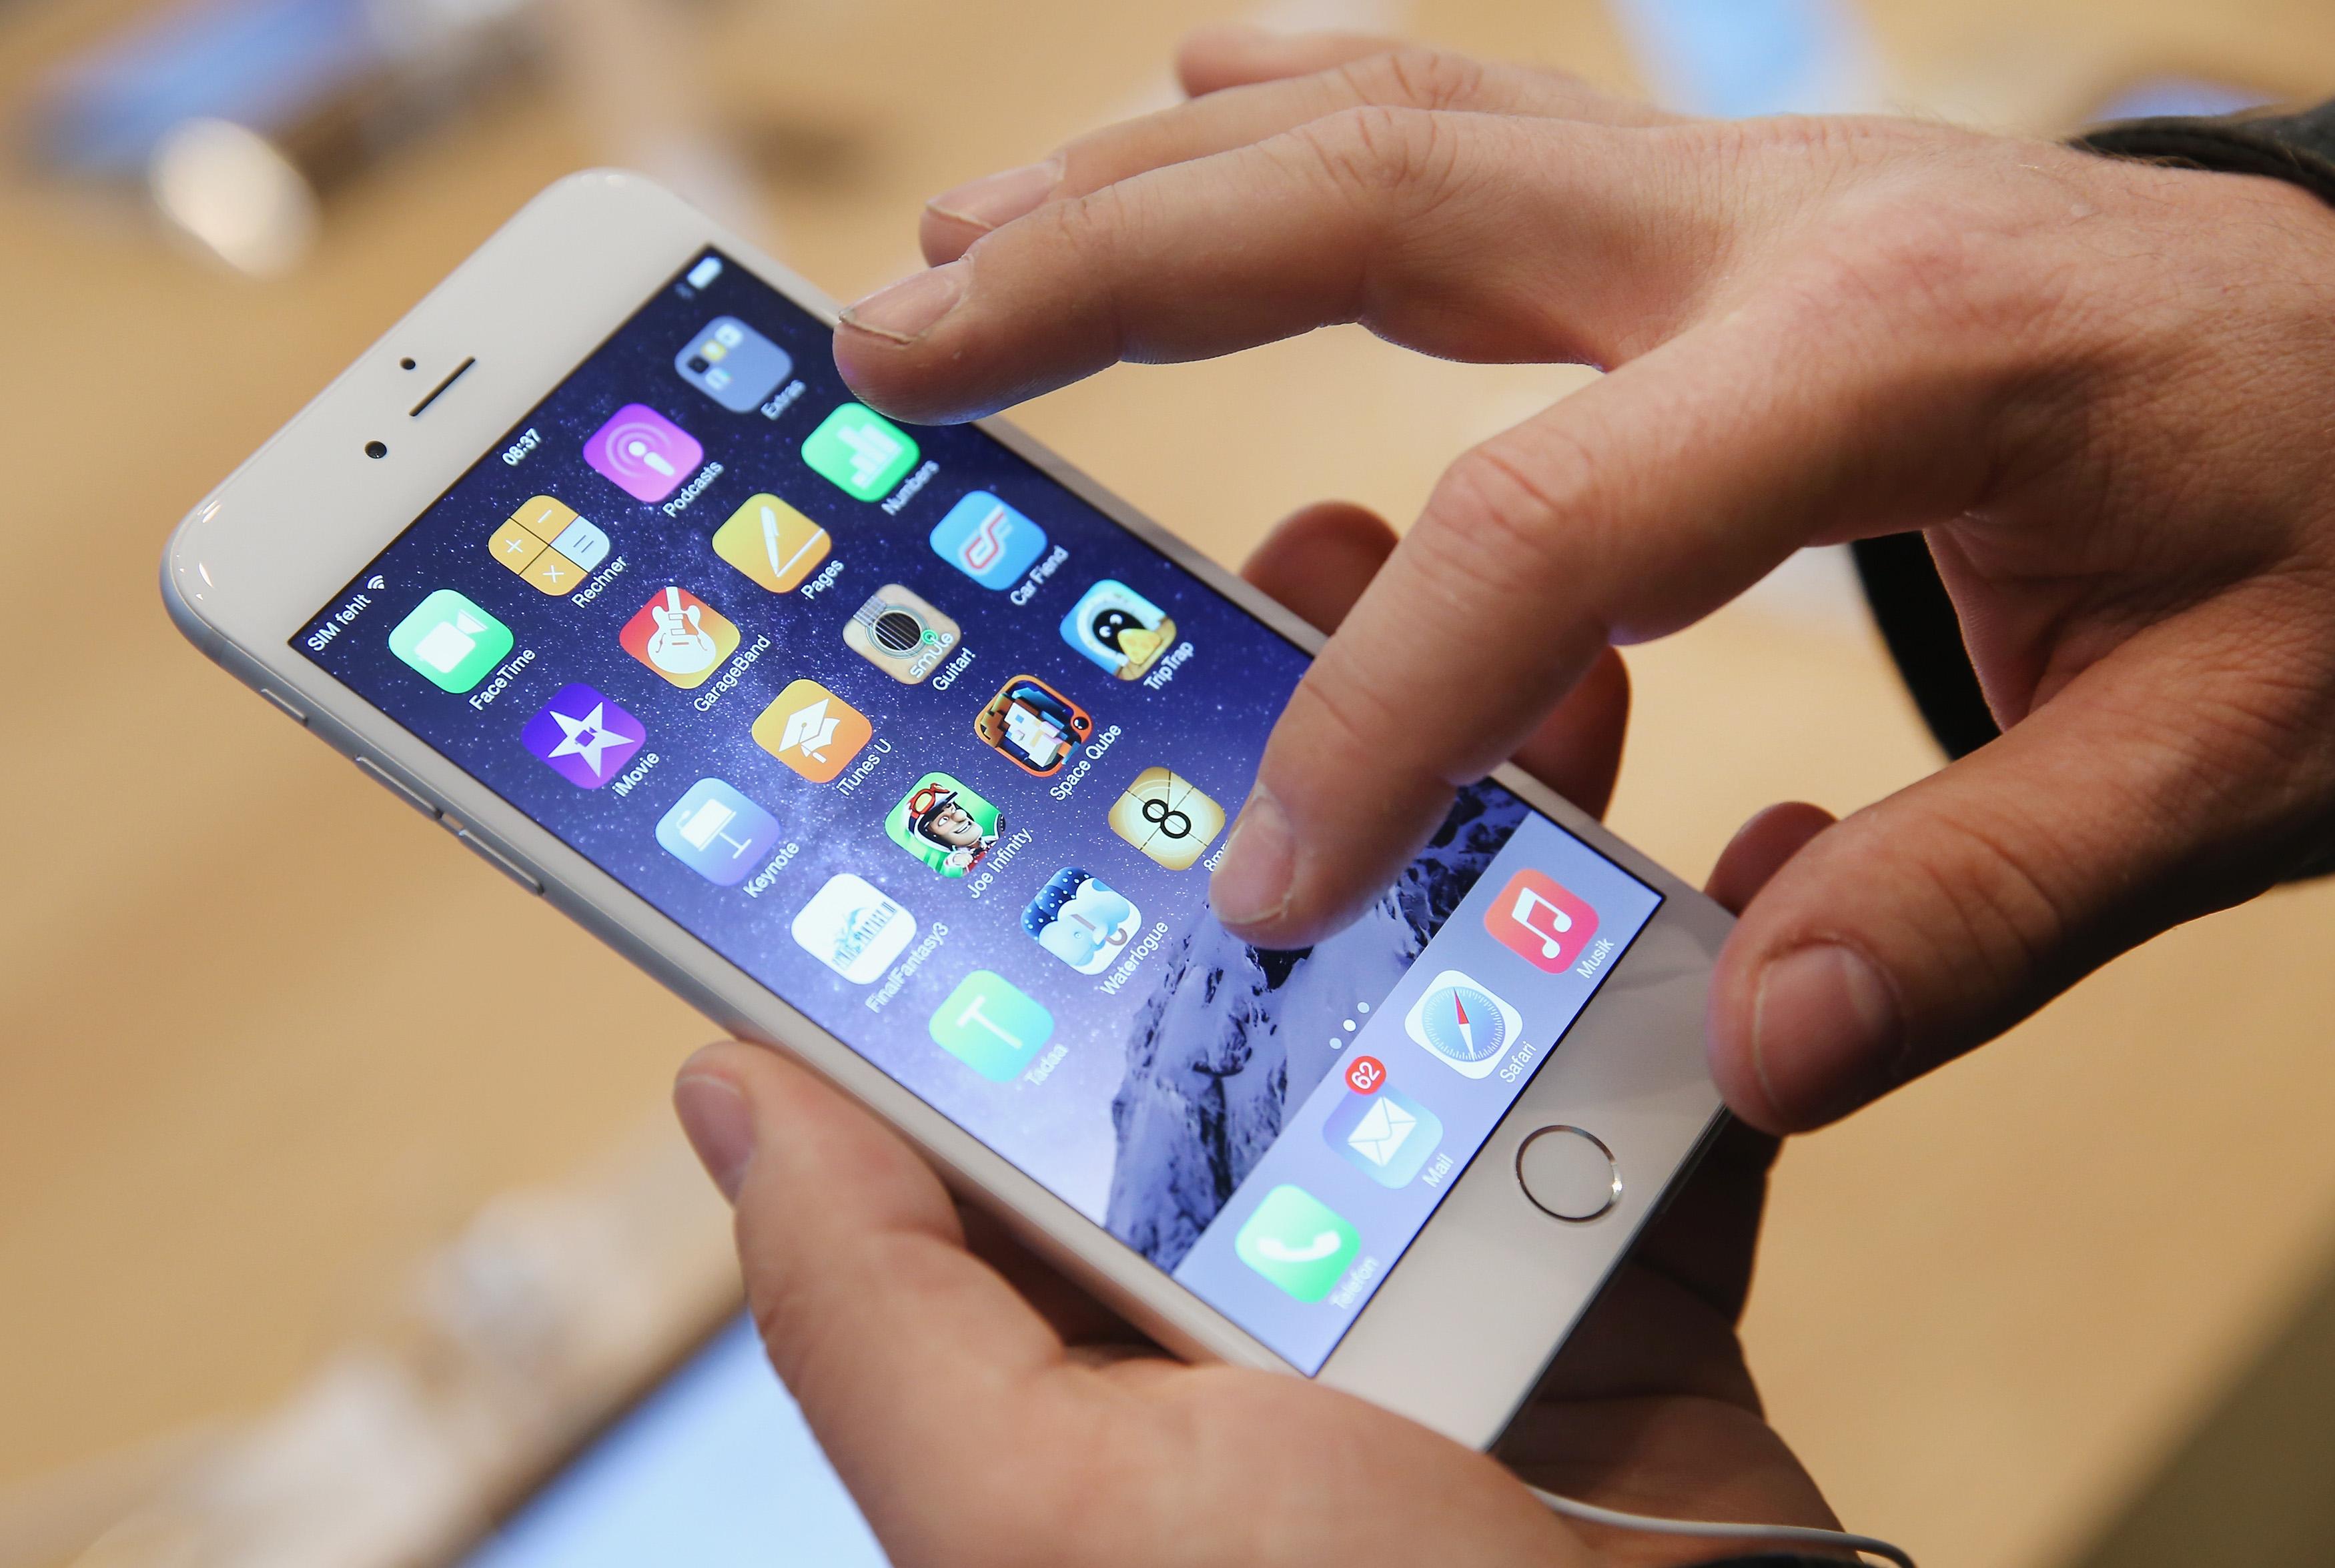 iPhone: panic command